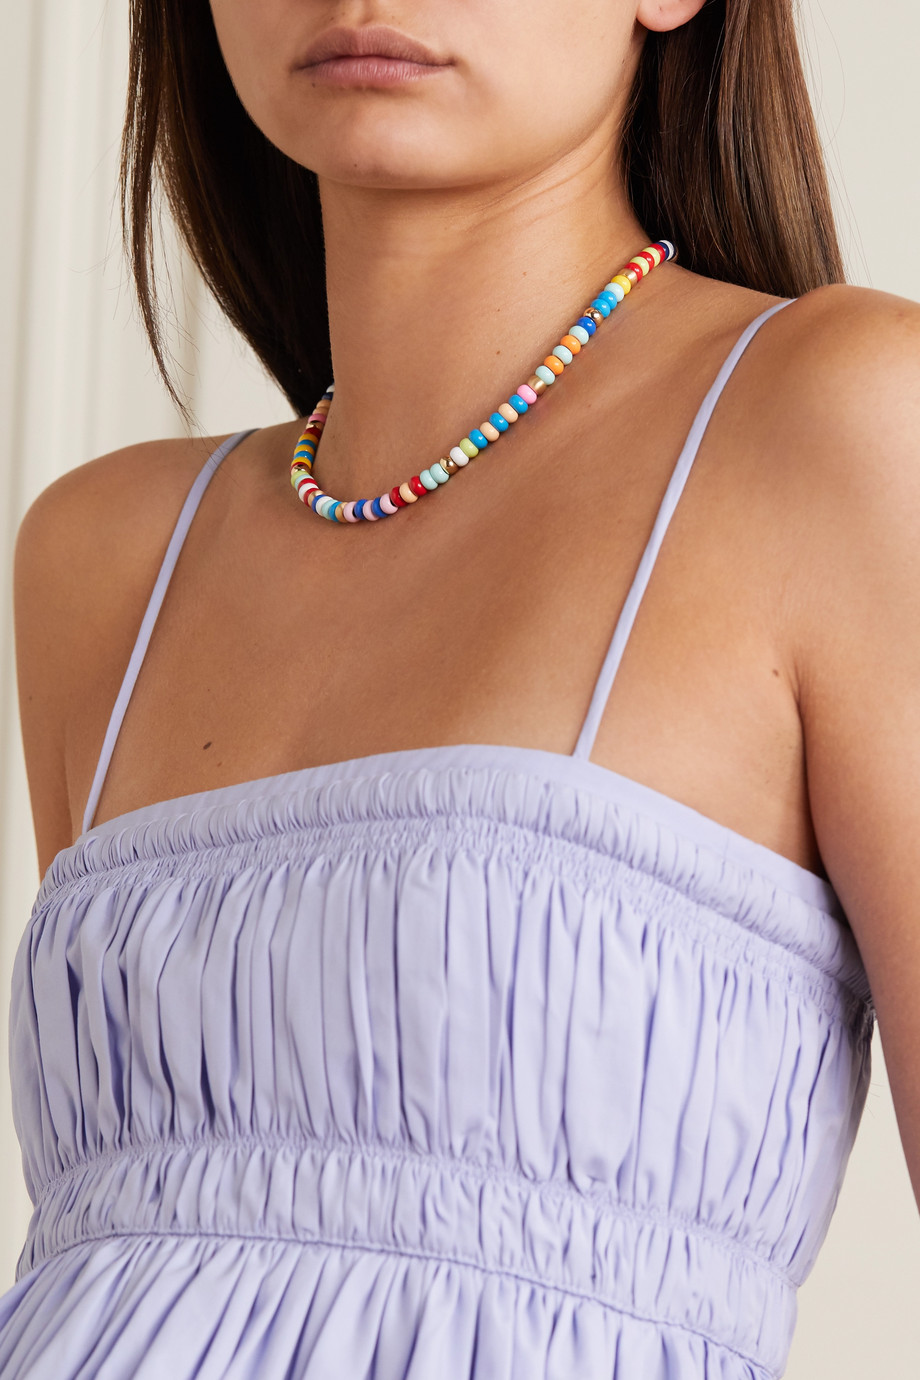 Roxanne Assoulin This And That Kette mit Emaille und roségoldfarbenen Details